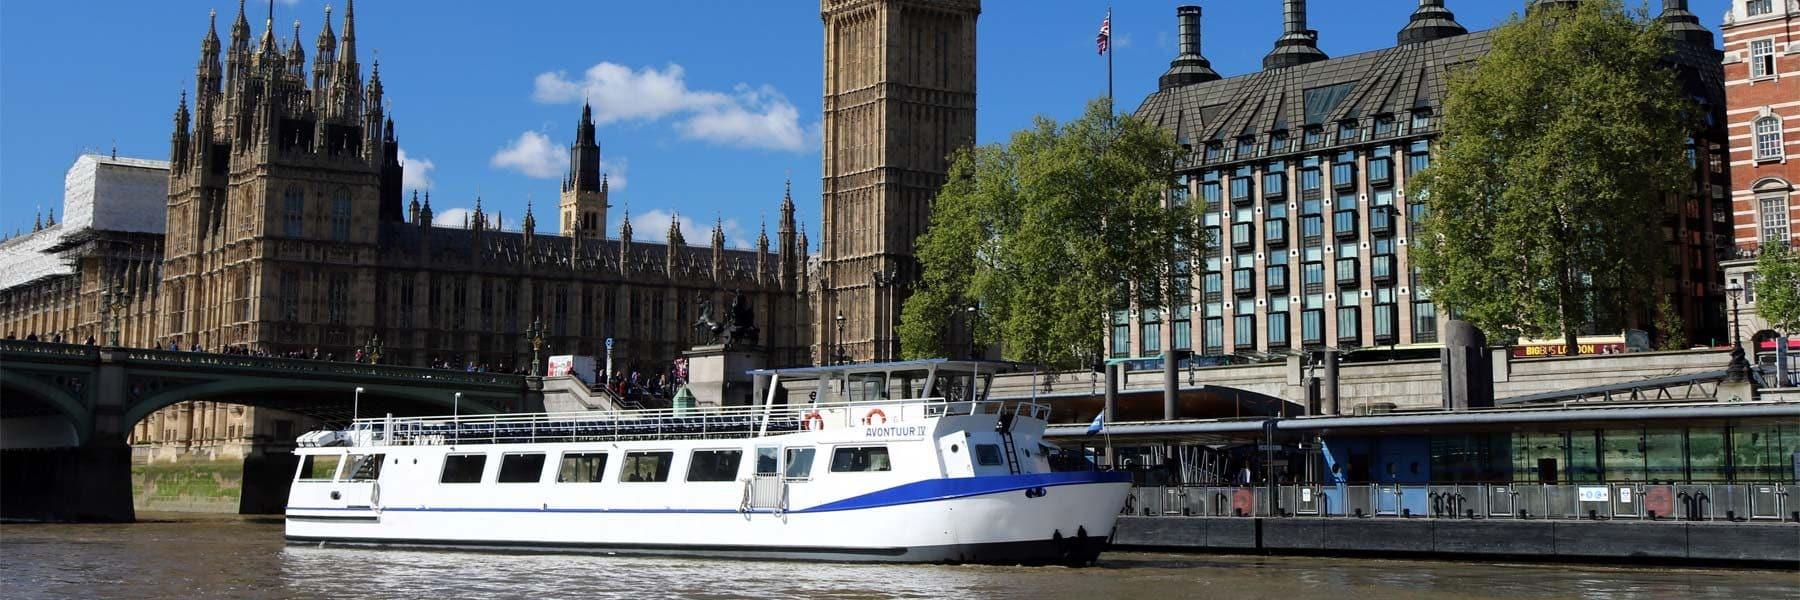 M.V Avontuur IV approaching Westminster Millennium Pier